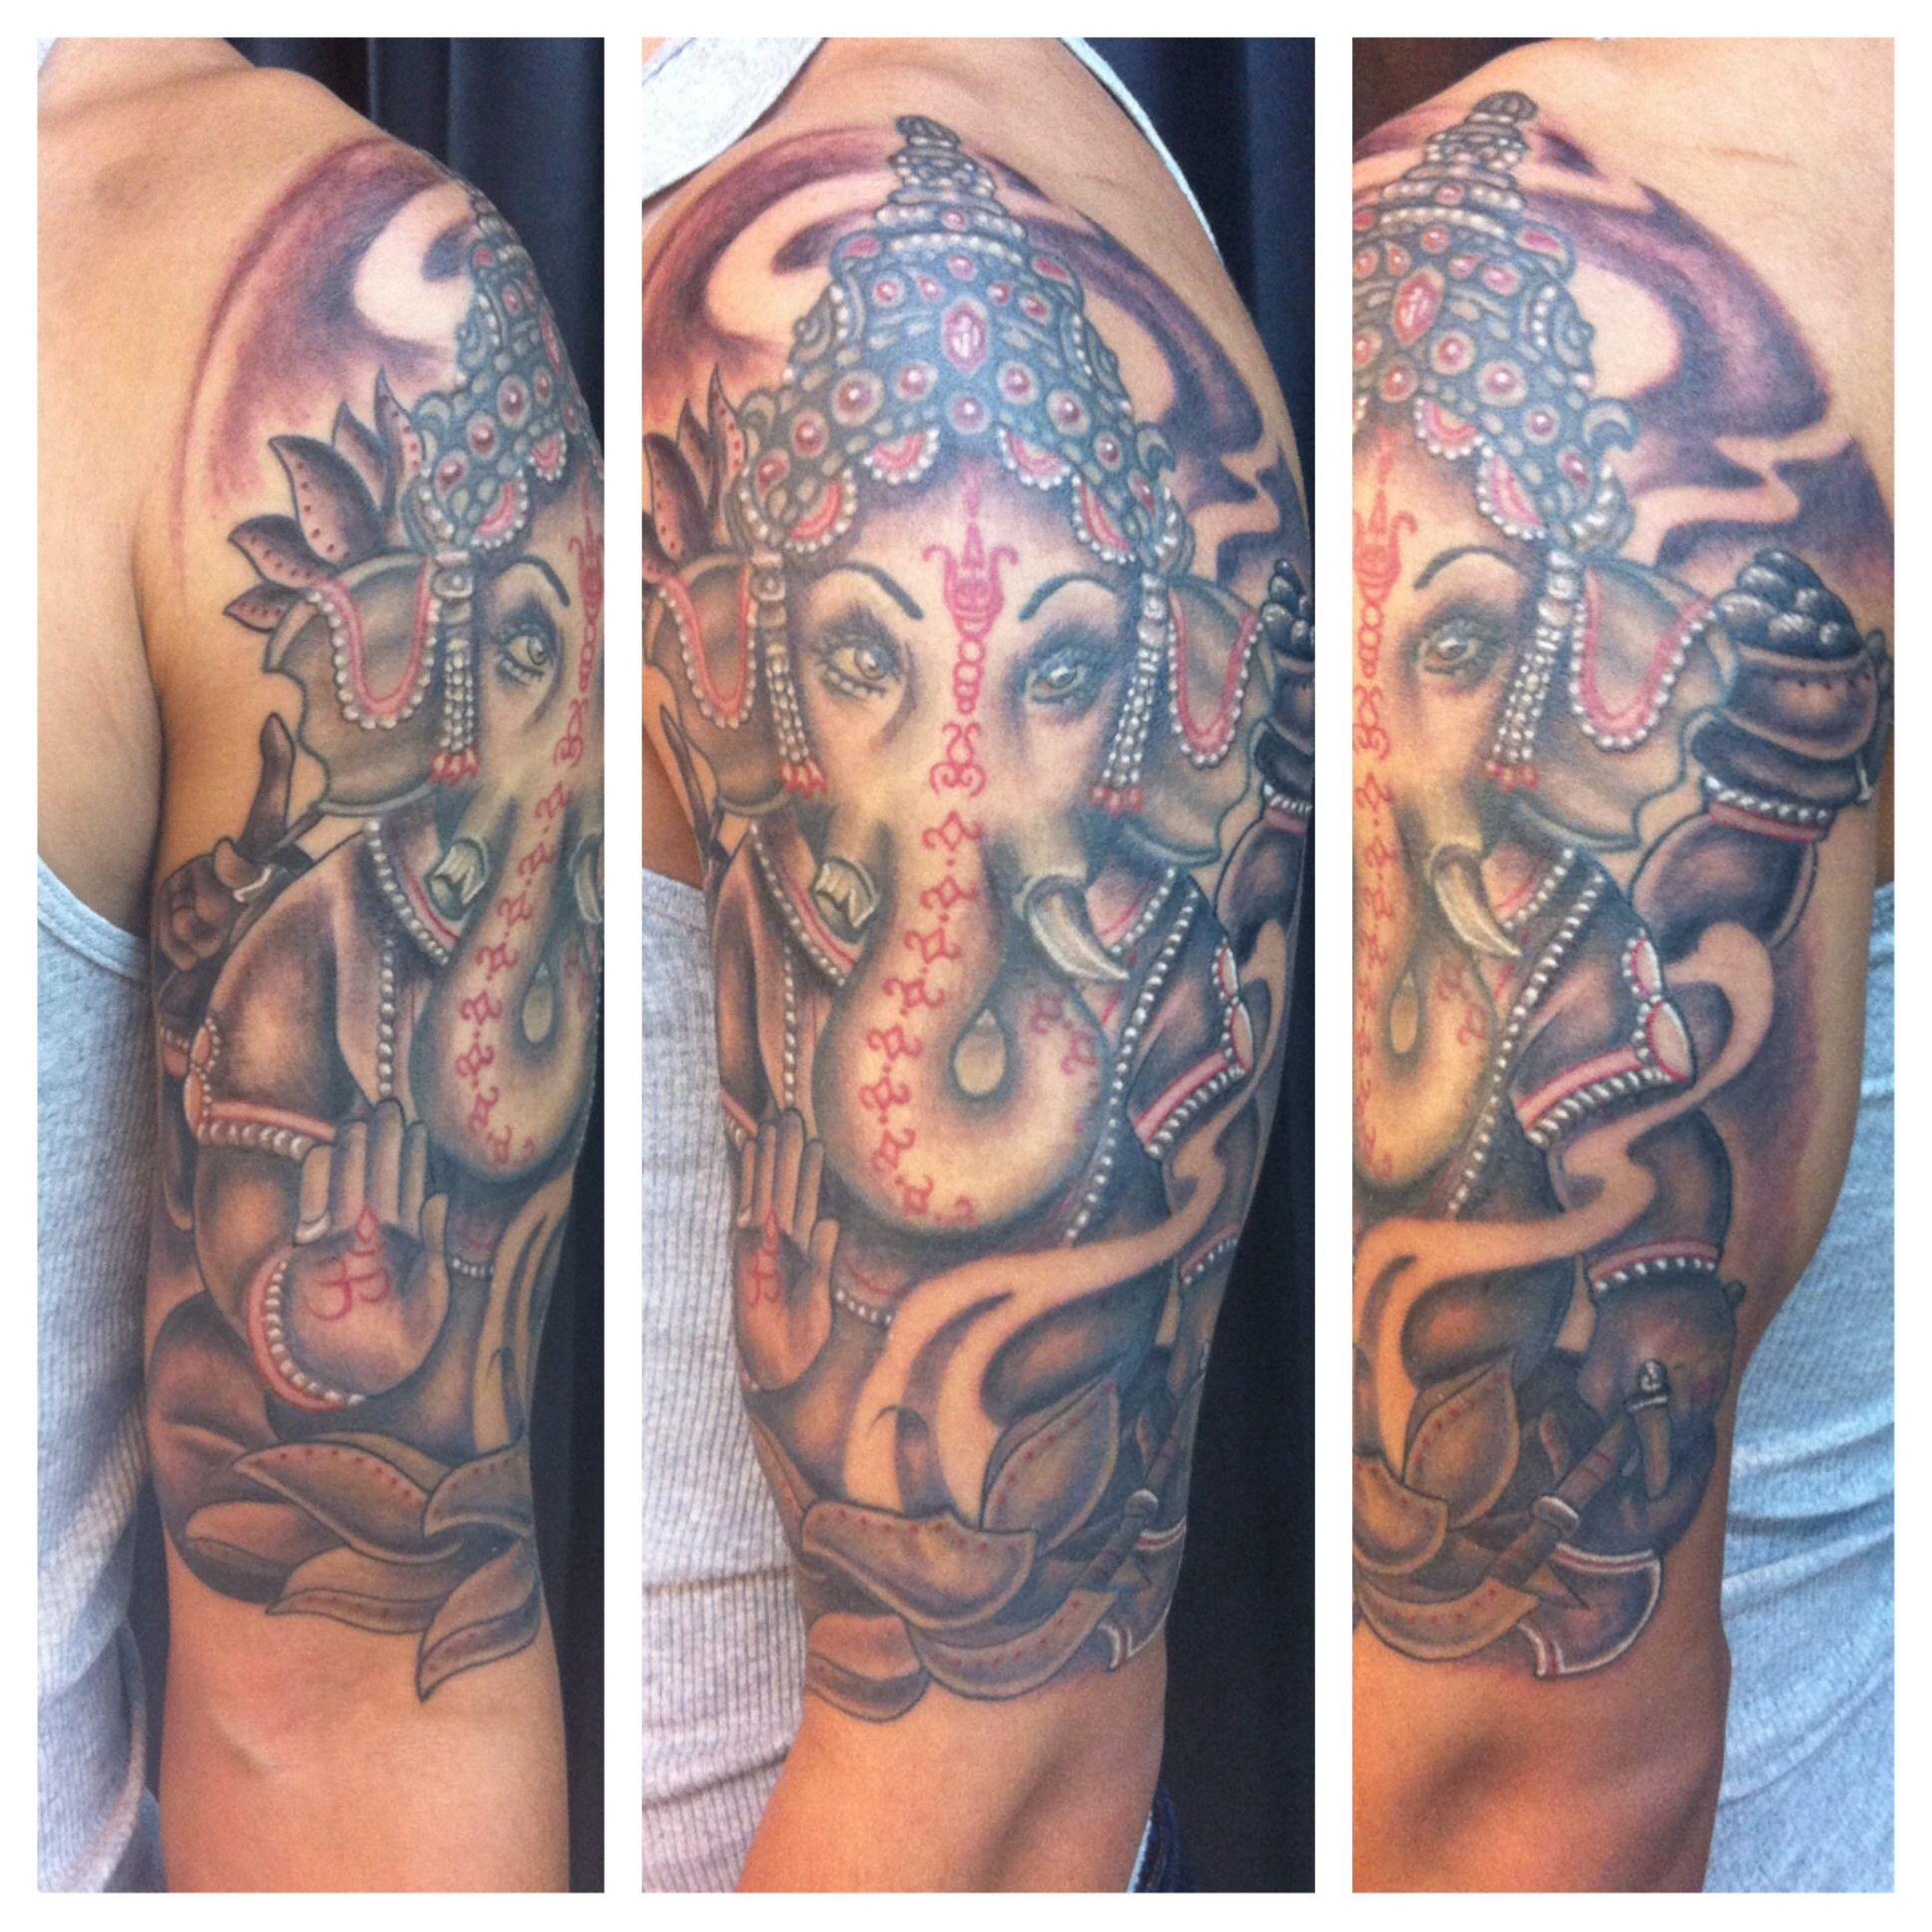 Eric diaz in san antonio portrait tattoo tattoos san